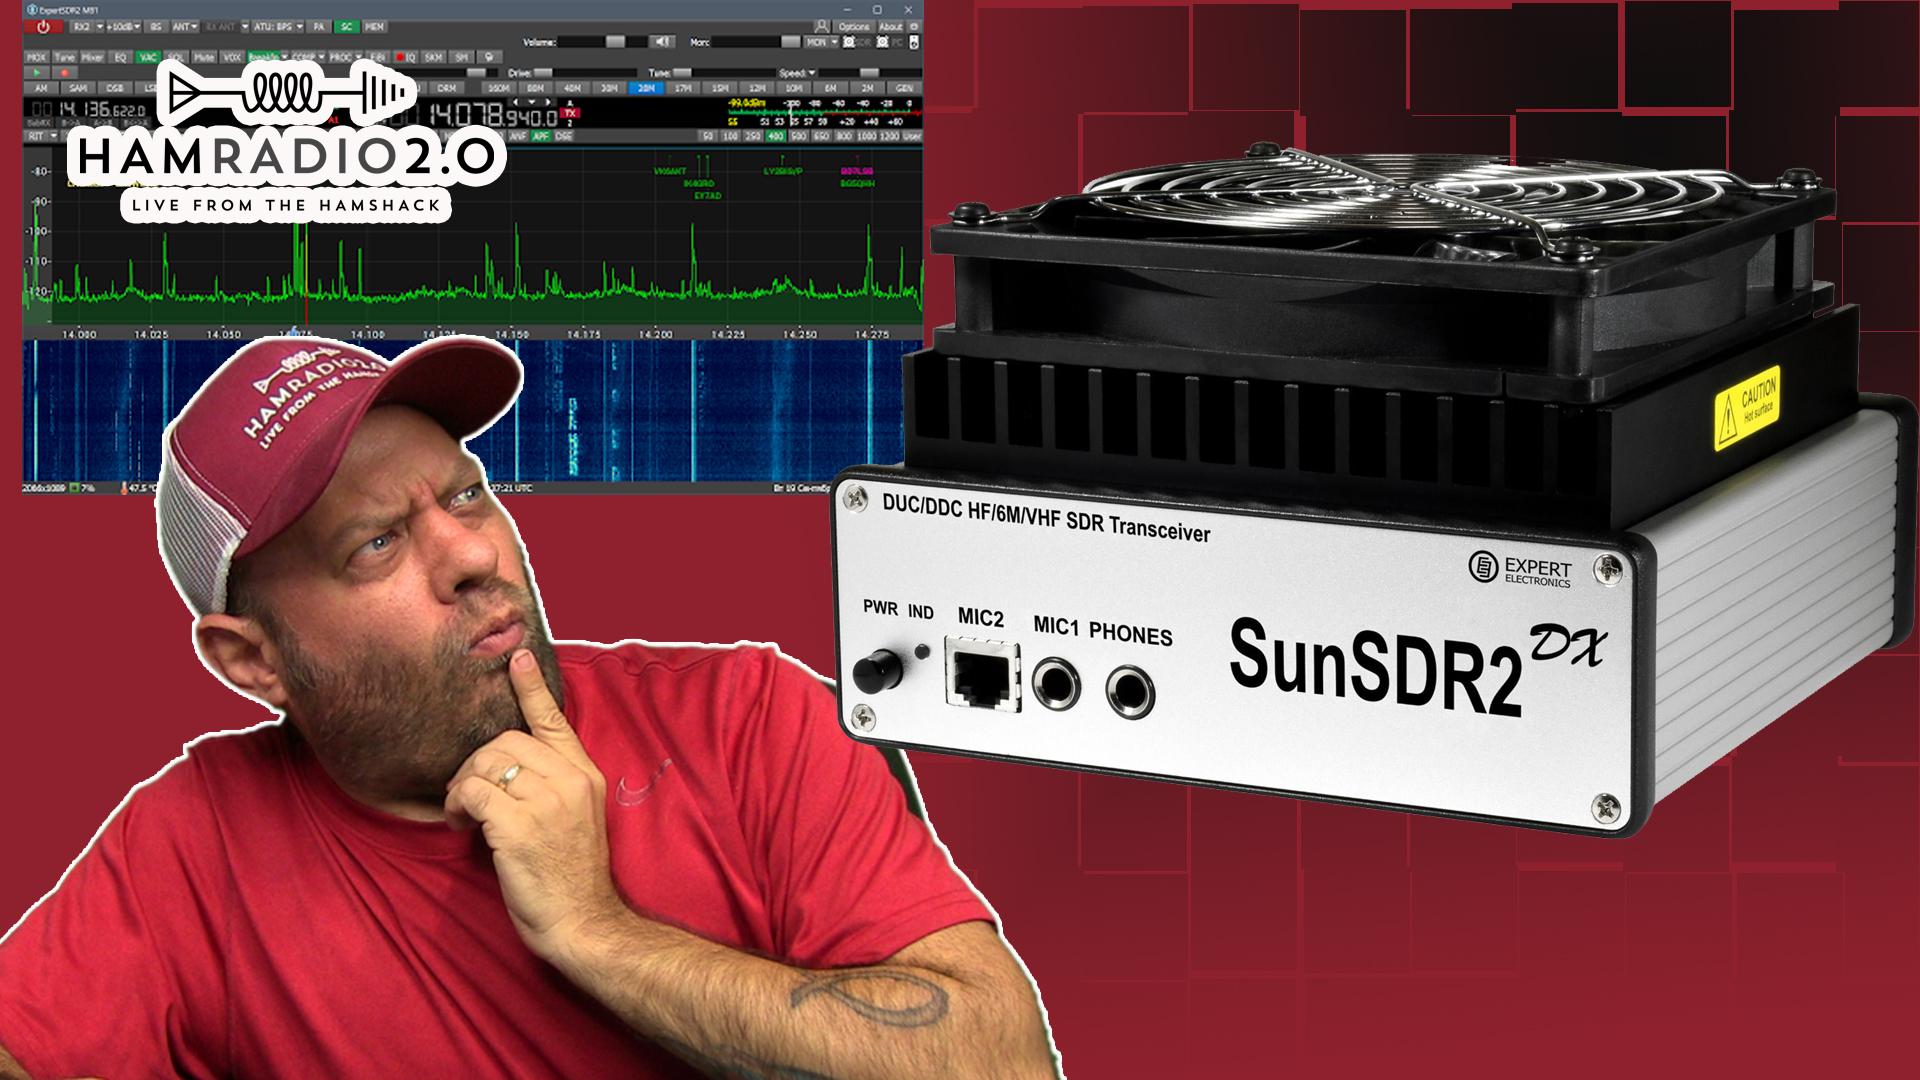 Episode 441: SunSDR2 DX HF Ham Radio Transceiver Setup and Demo